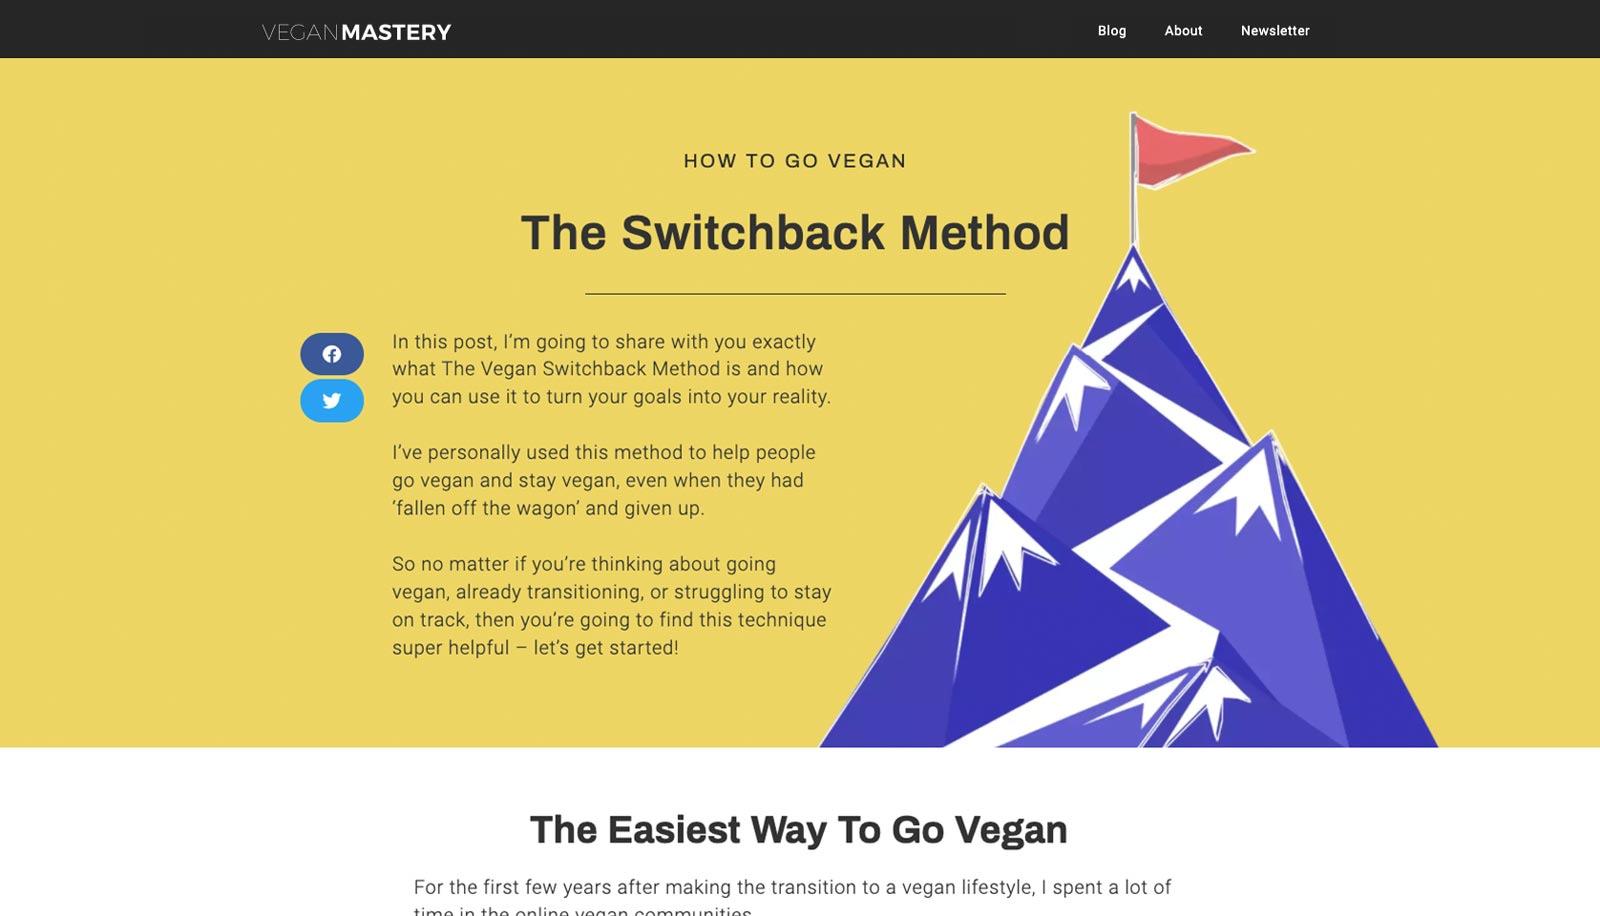 Going vegan has never been so easy with The Vegan Switchback Method - Vegan Mastery